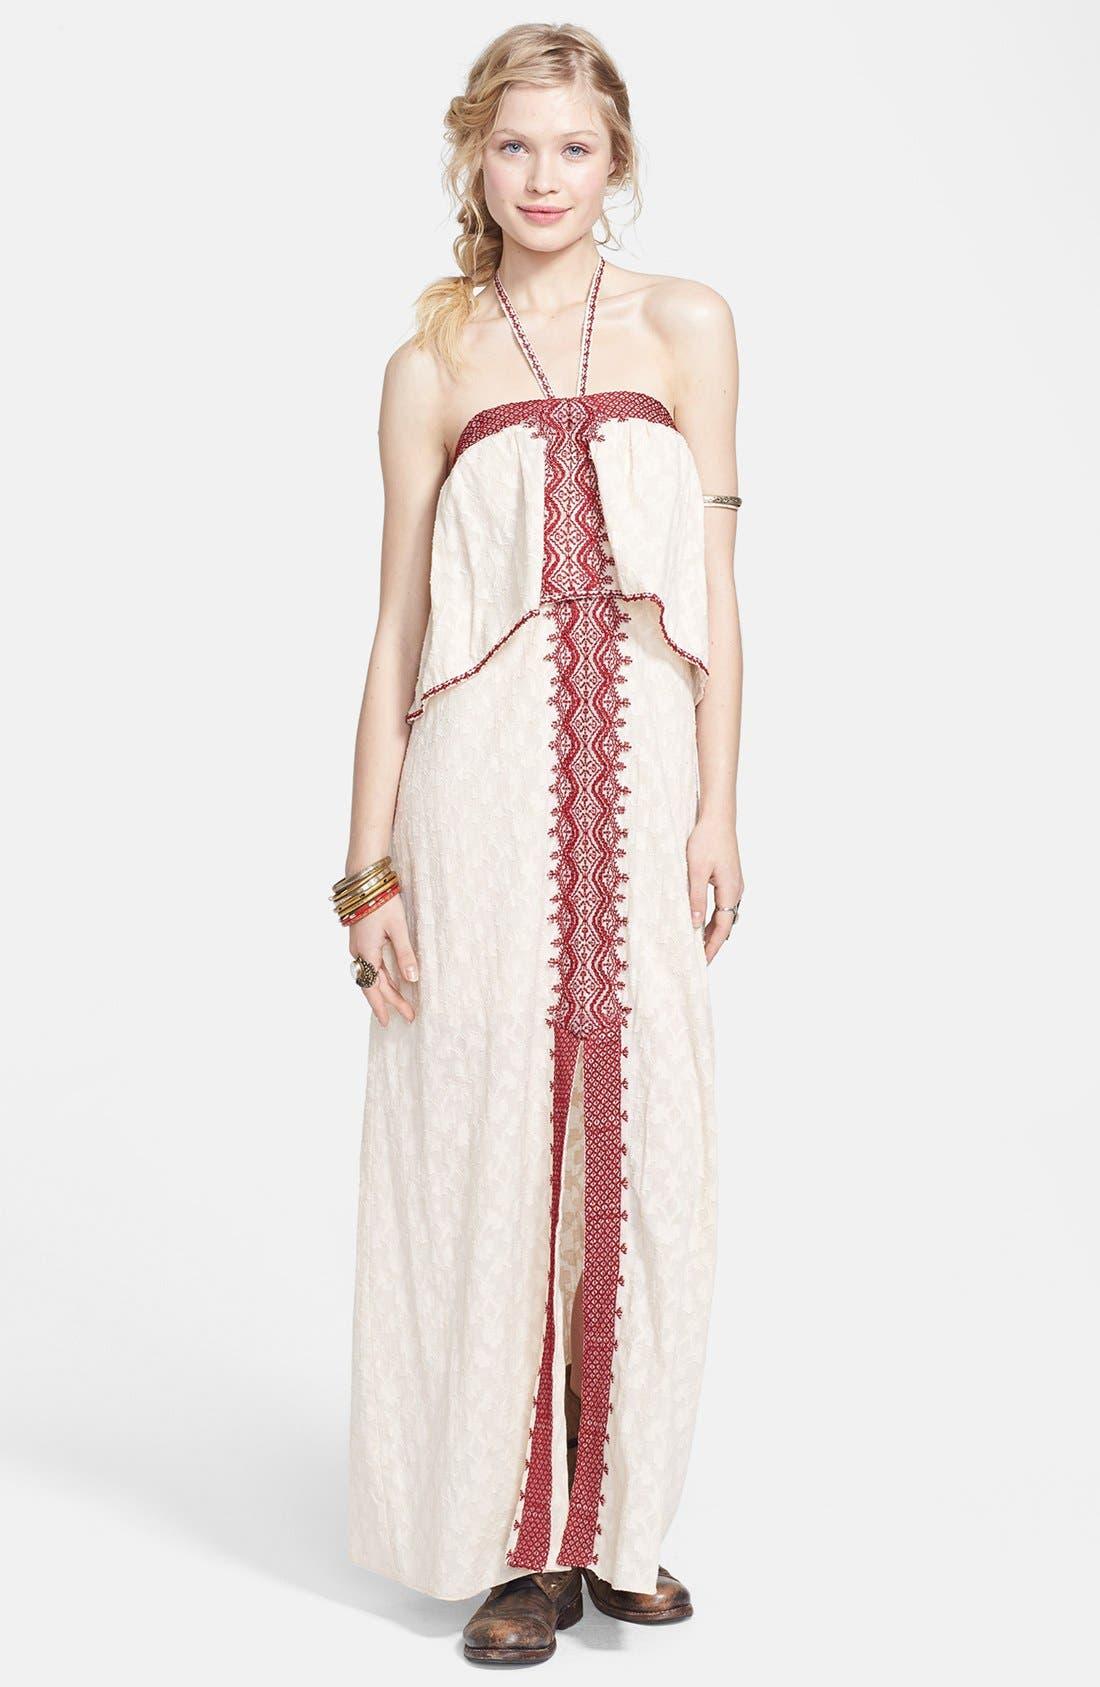 Alternate Image 1 Selected - Free People 'Marrakesh' Lace Trim Jacquard Halter Maxi Dress